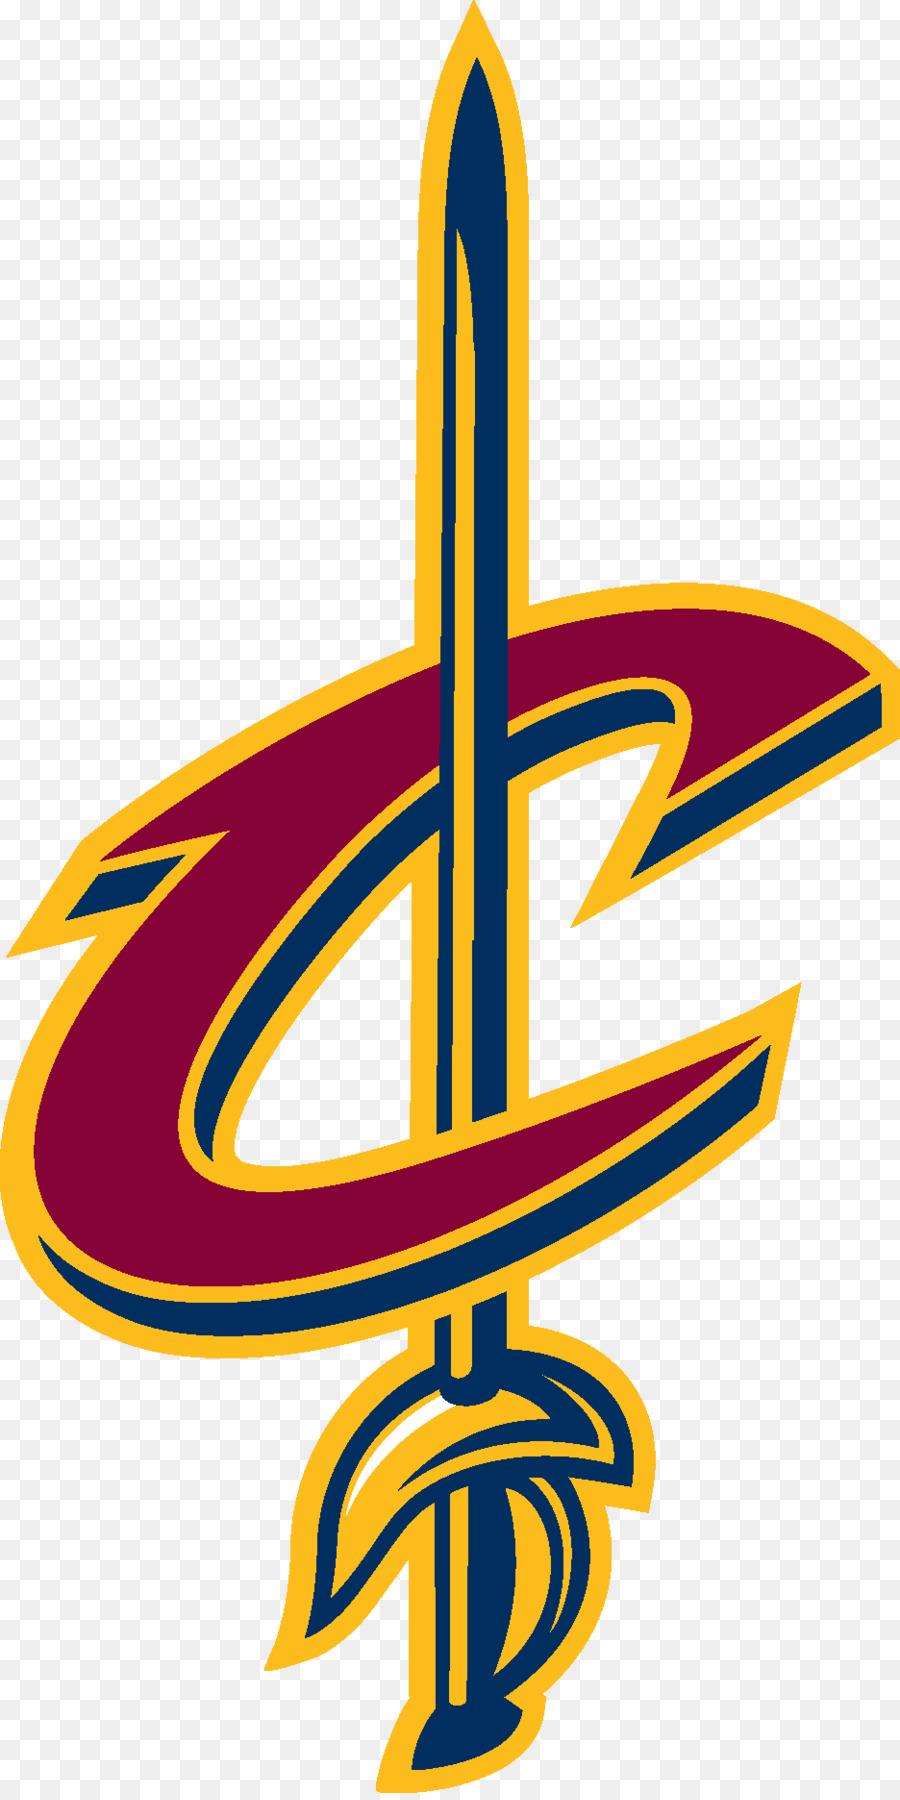 Cleveland Cavaliers 2016 NBA Finals Quicken Loans Arena.